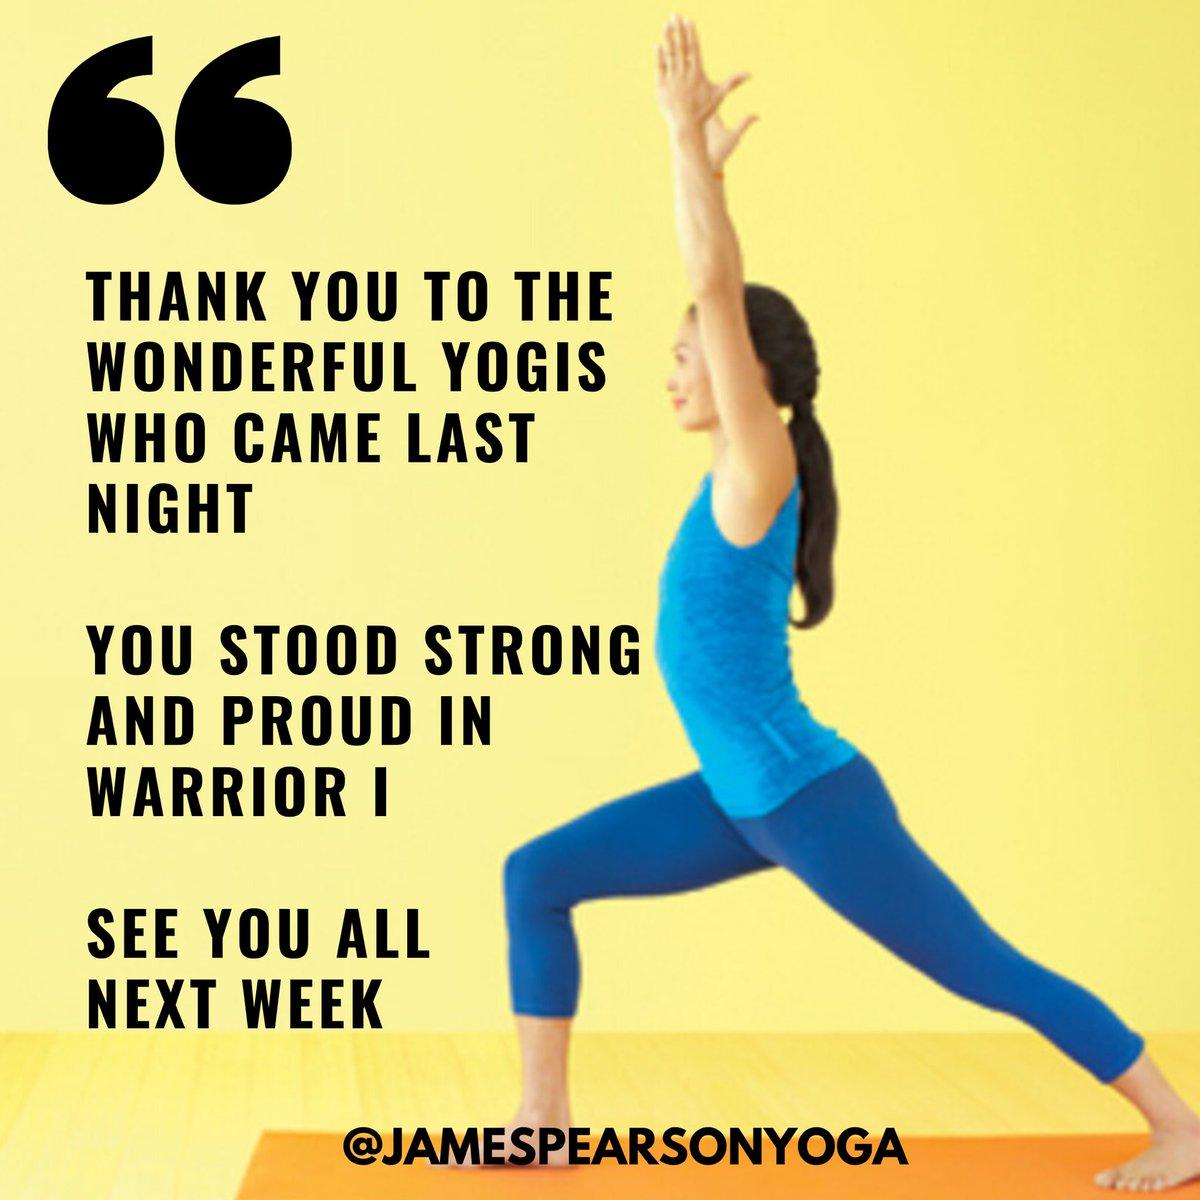 #onmondayswedoyoga #yoga #yogaclass #yogateacher #yogaliverpool #yogaforbeginners #southliverpool #aigburth #aigburthroad #larklane #thankyou #grateful #gratitude #yogalife #yogapractice pic.twitter.com/wsyXglDsdi